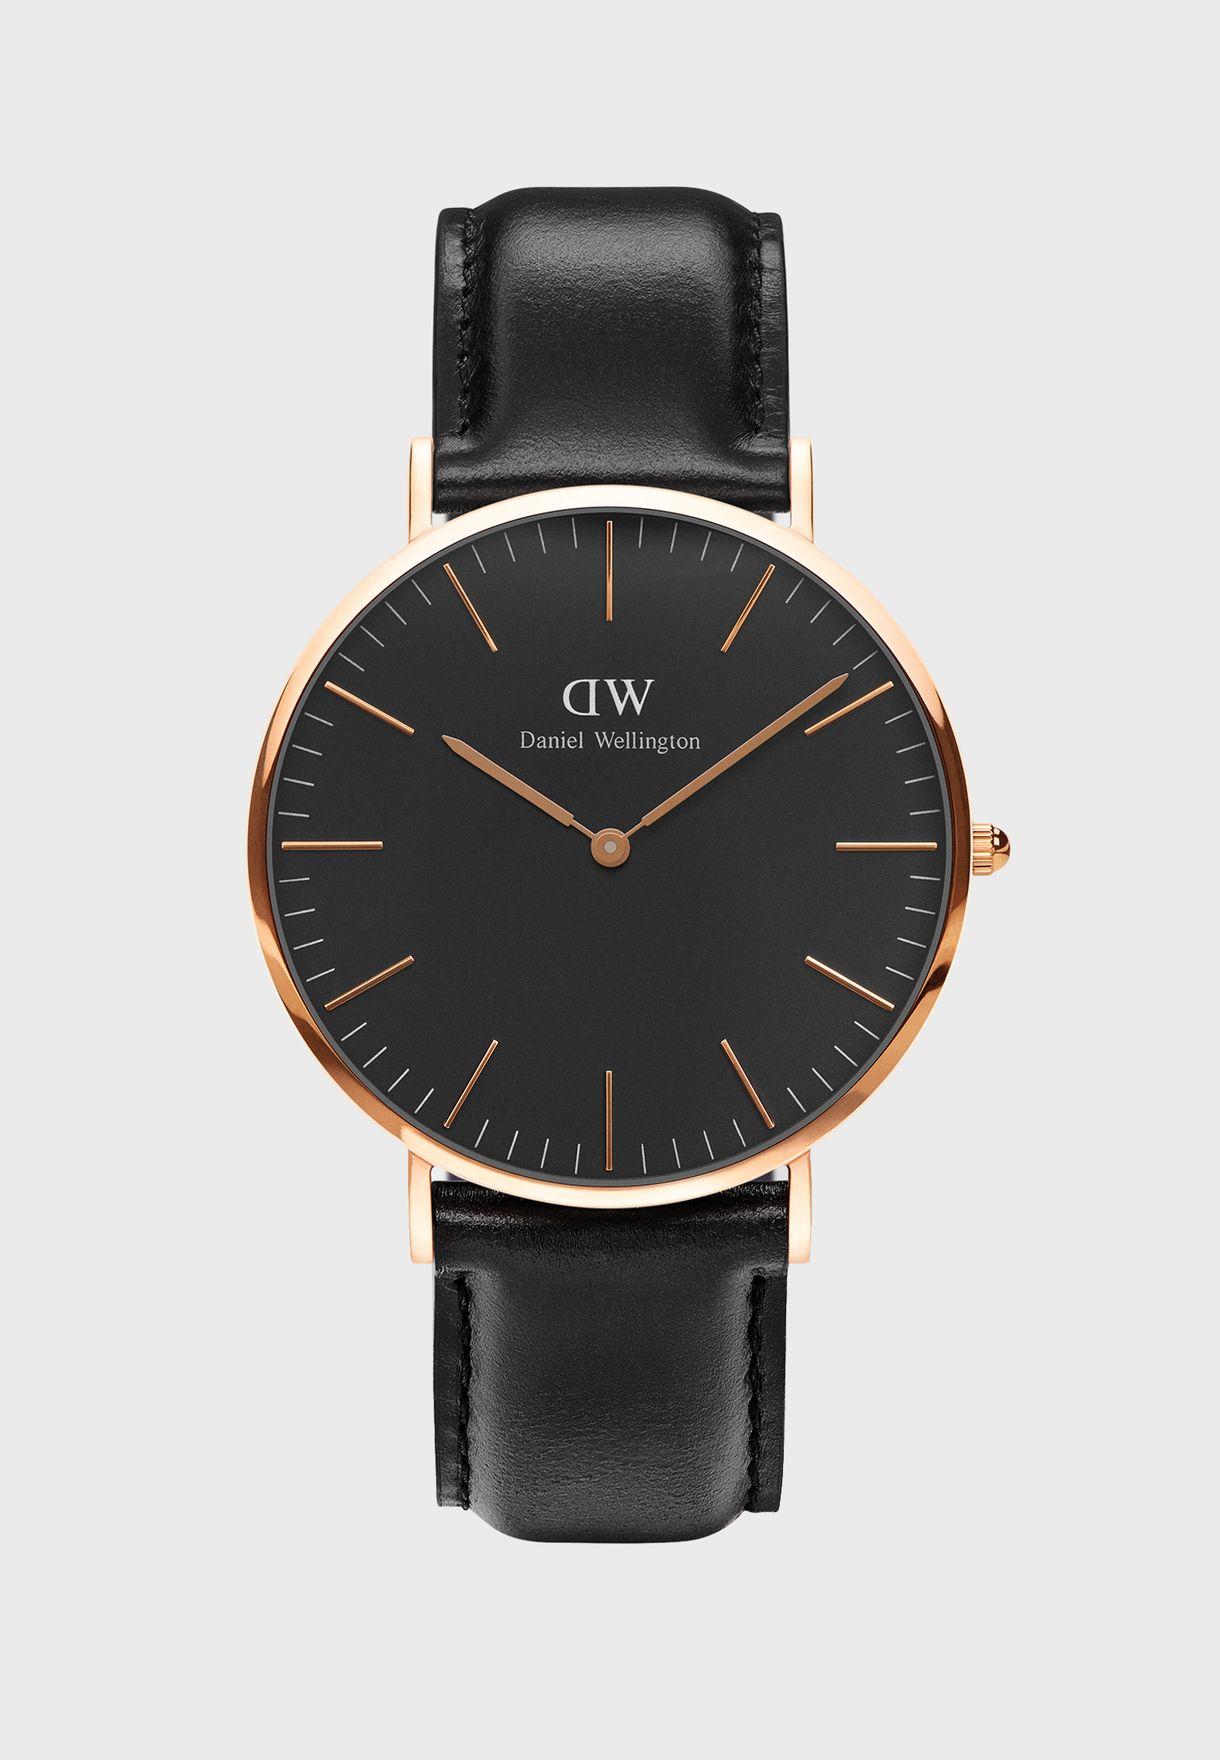 4eb32ace5978c تسوق ساعة شيفيلد الكلاسيكية ماركة دانيال ولينغتون لون أسود ...